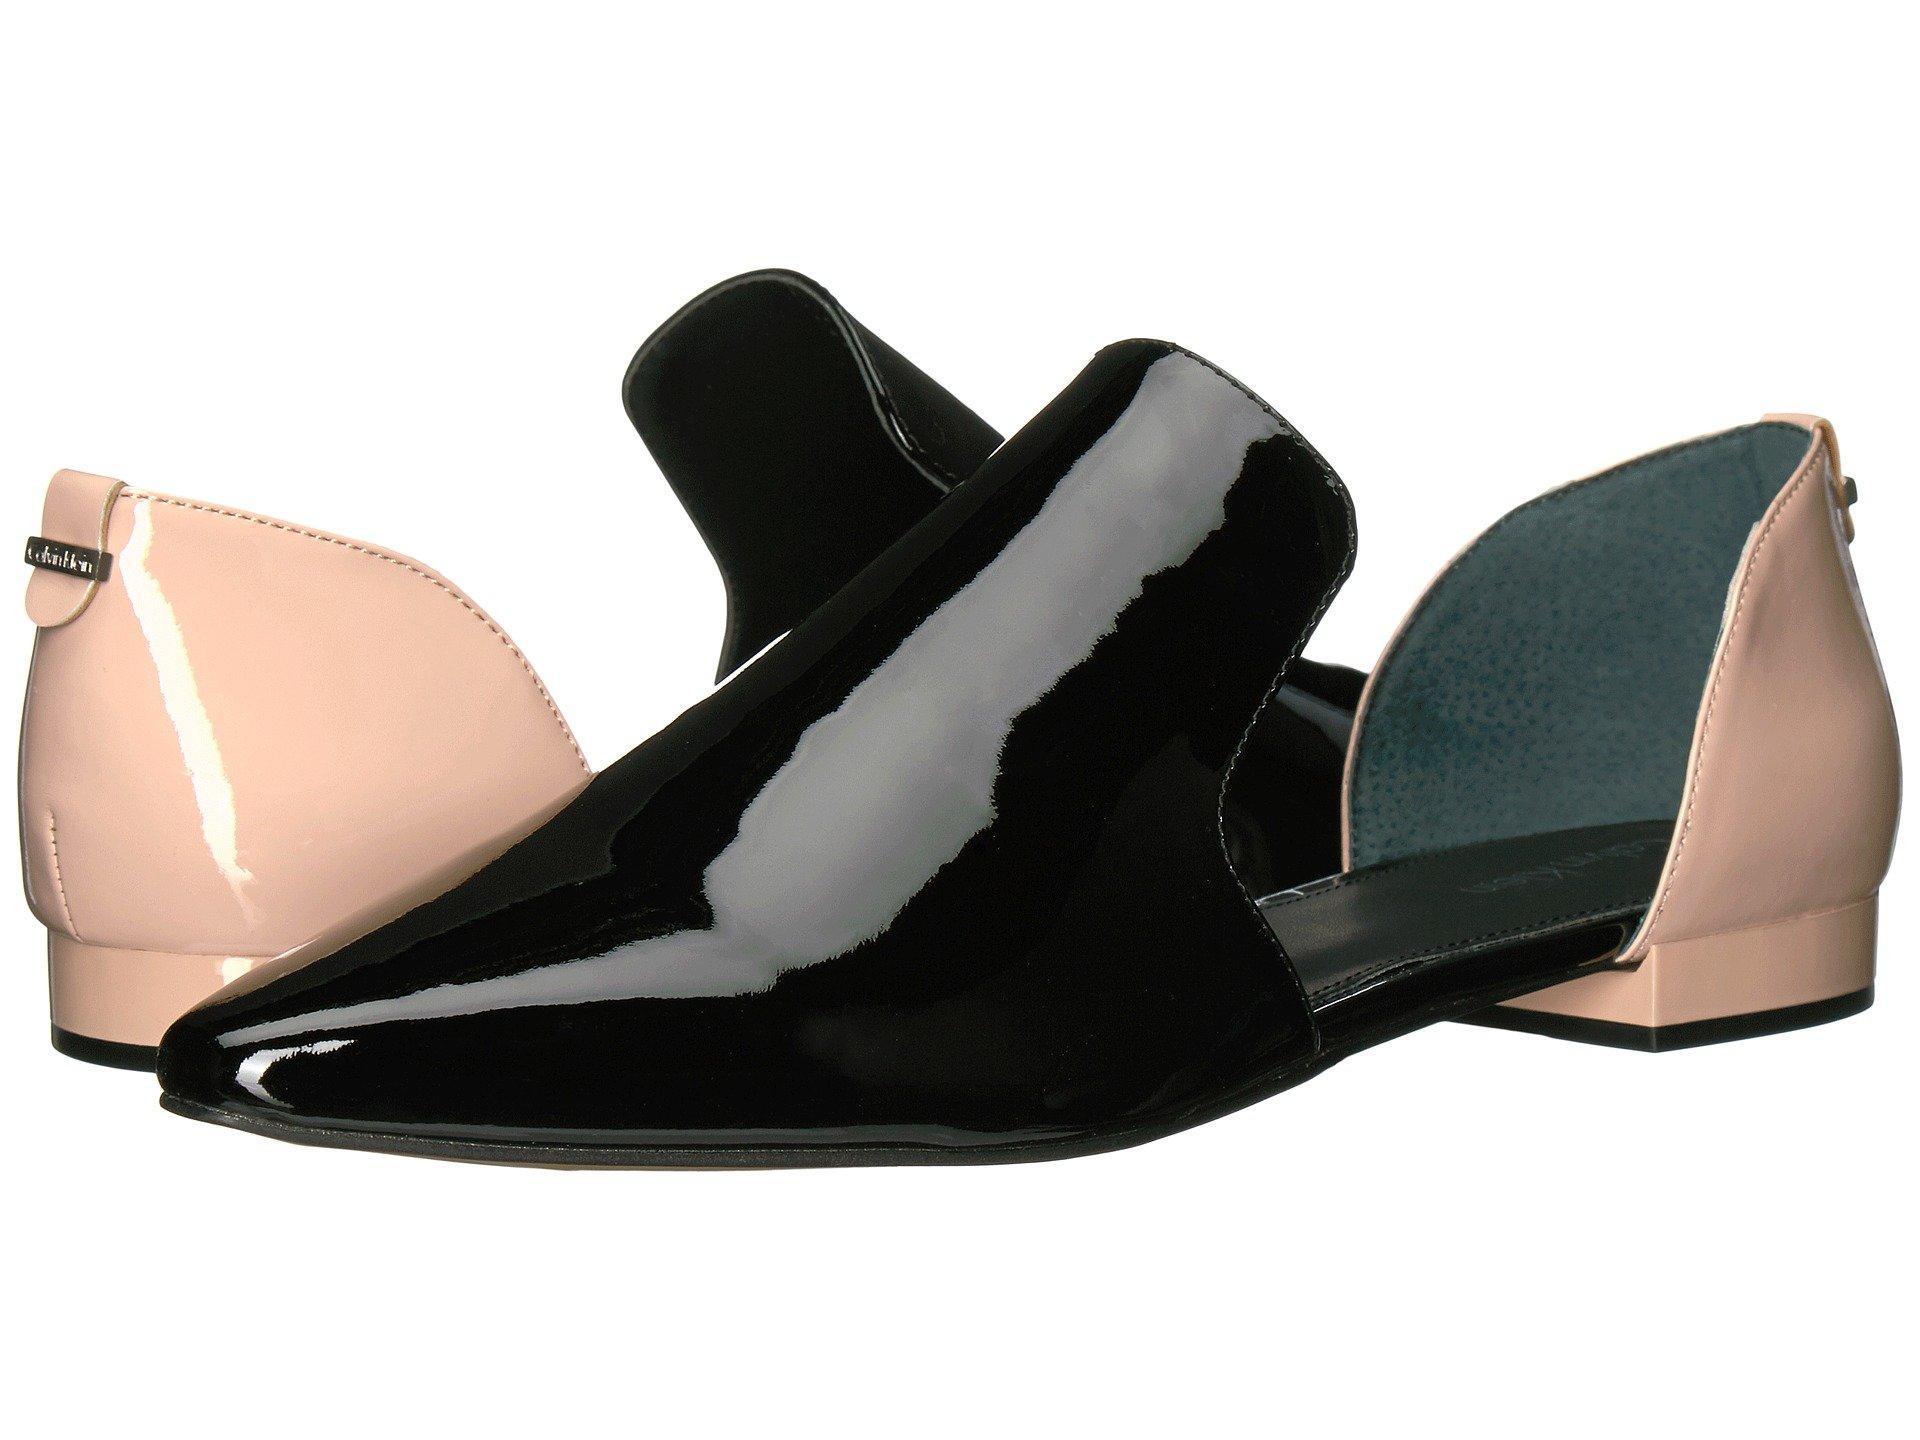 Calvin Klein Edona Loafer Flat In Black/ Sheer Satin